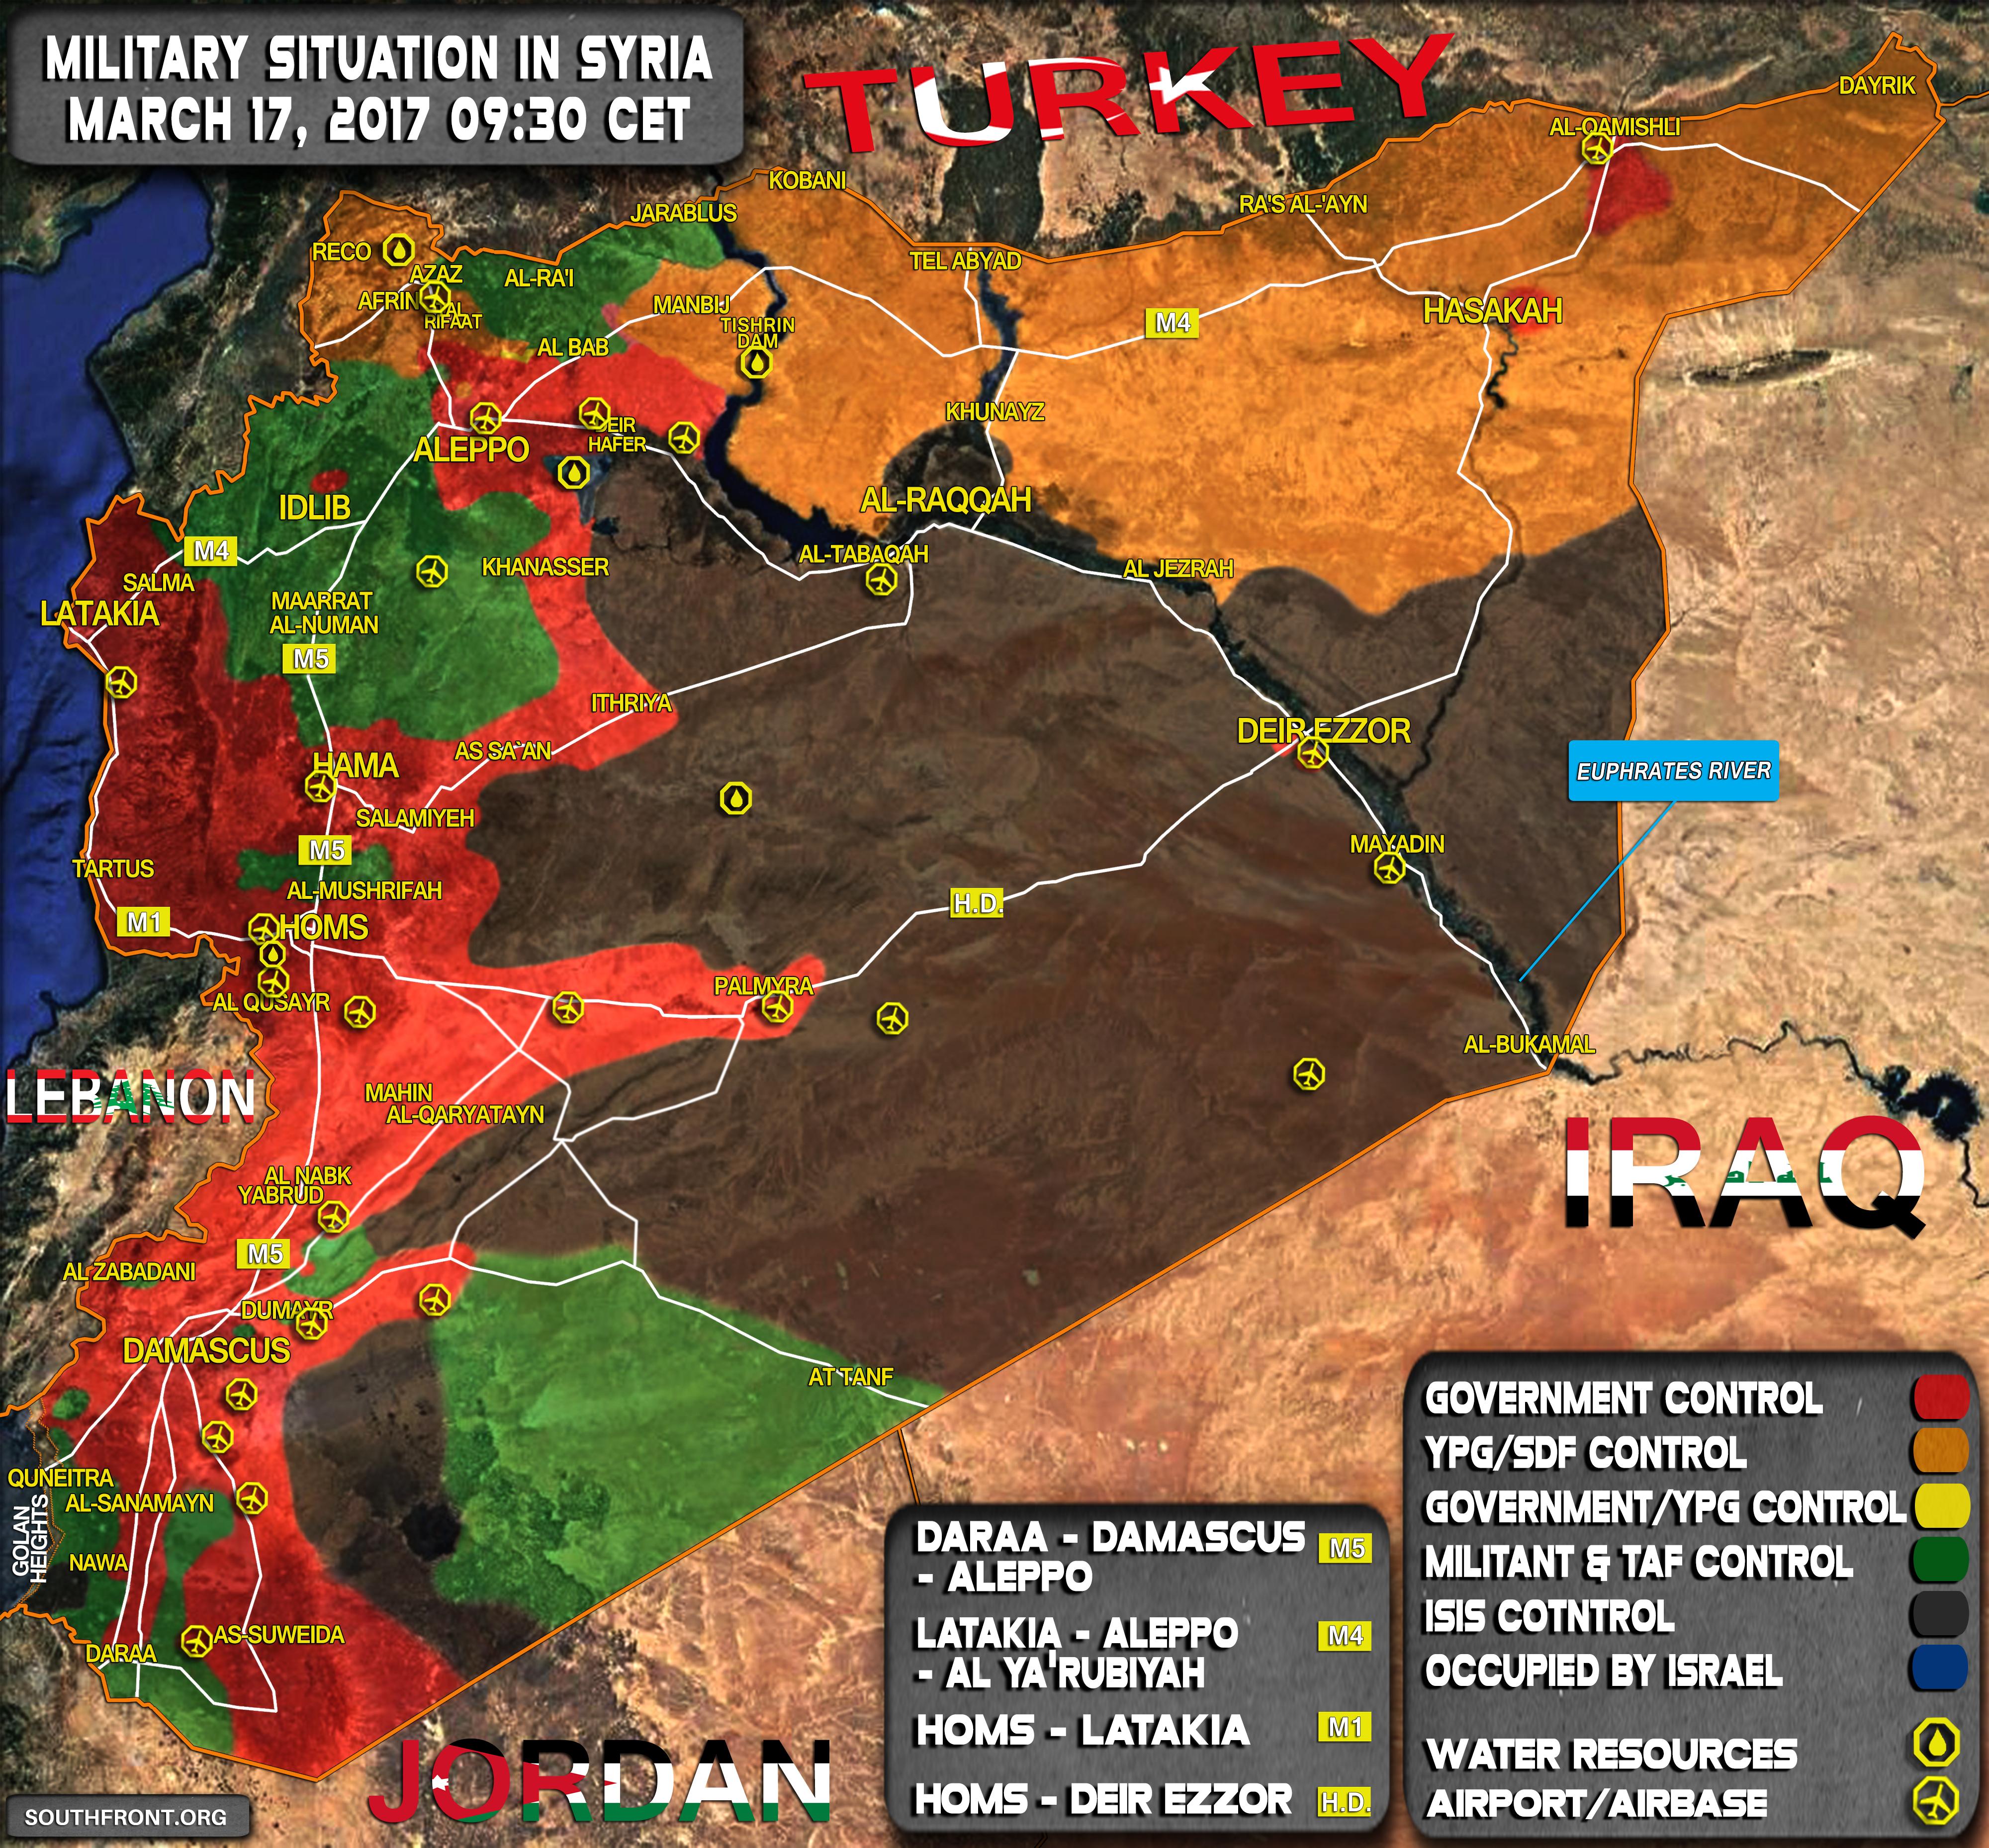 17m_09_30_syria_war_map